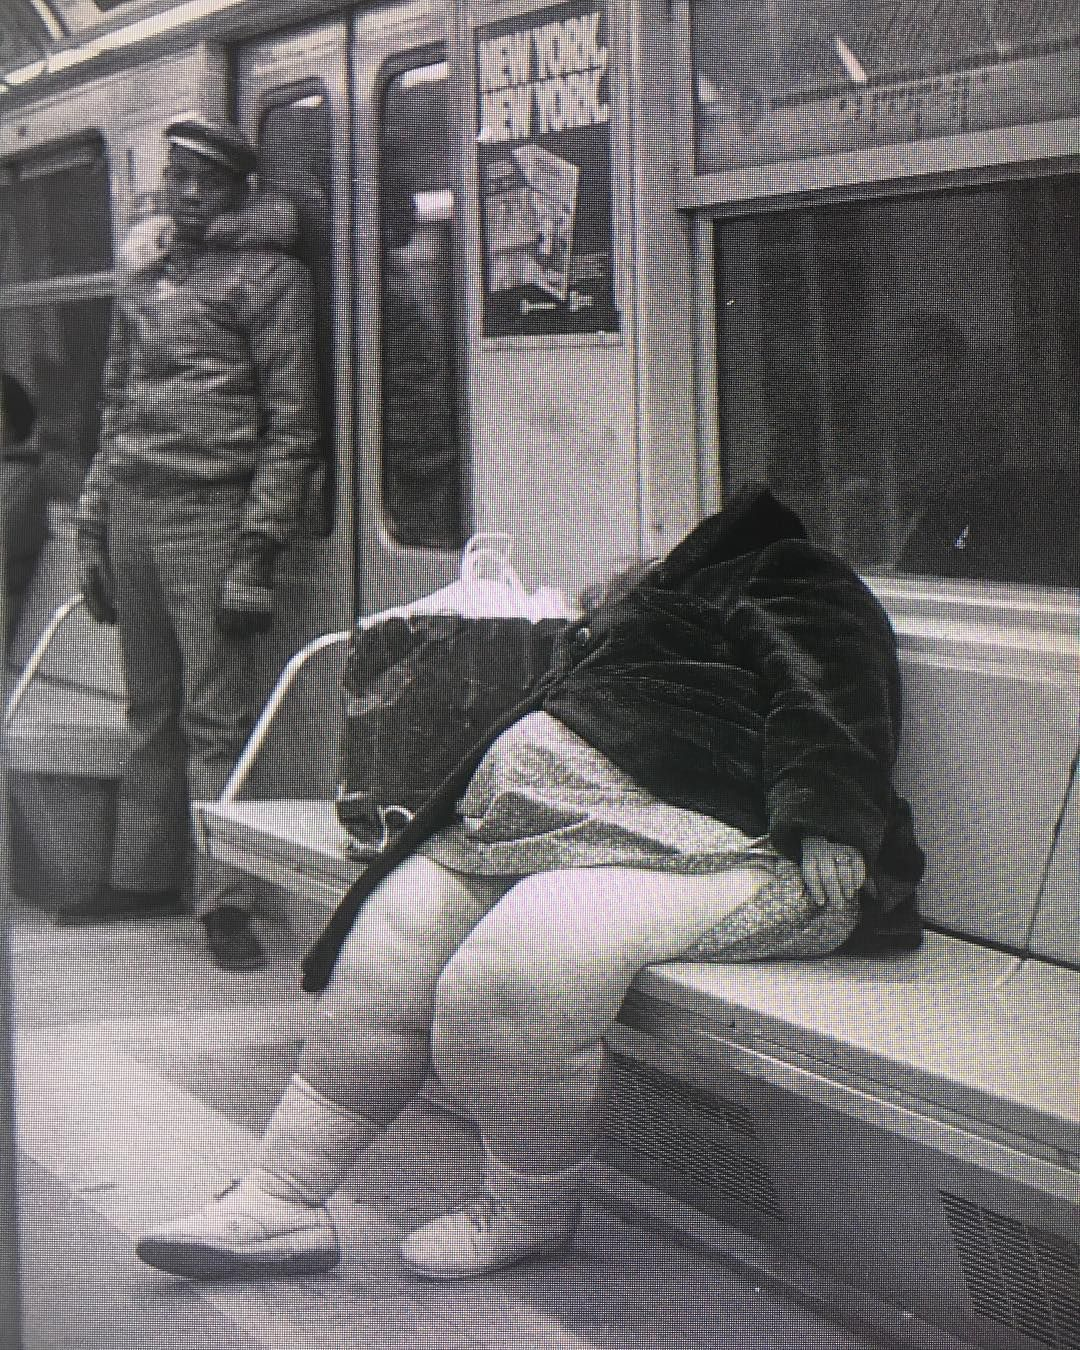 Stunning Vintage Photos That Capture New York's Su